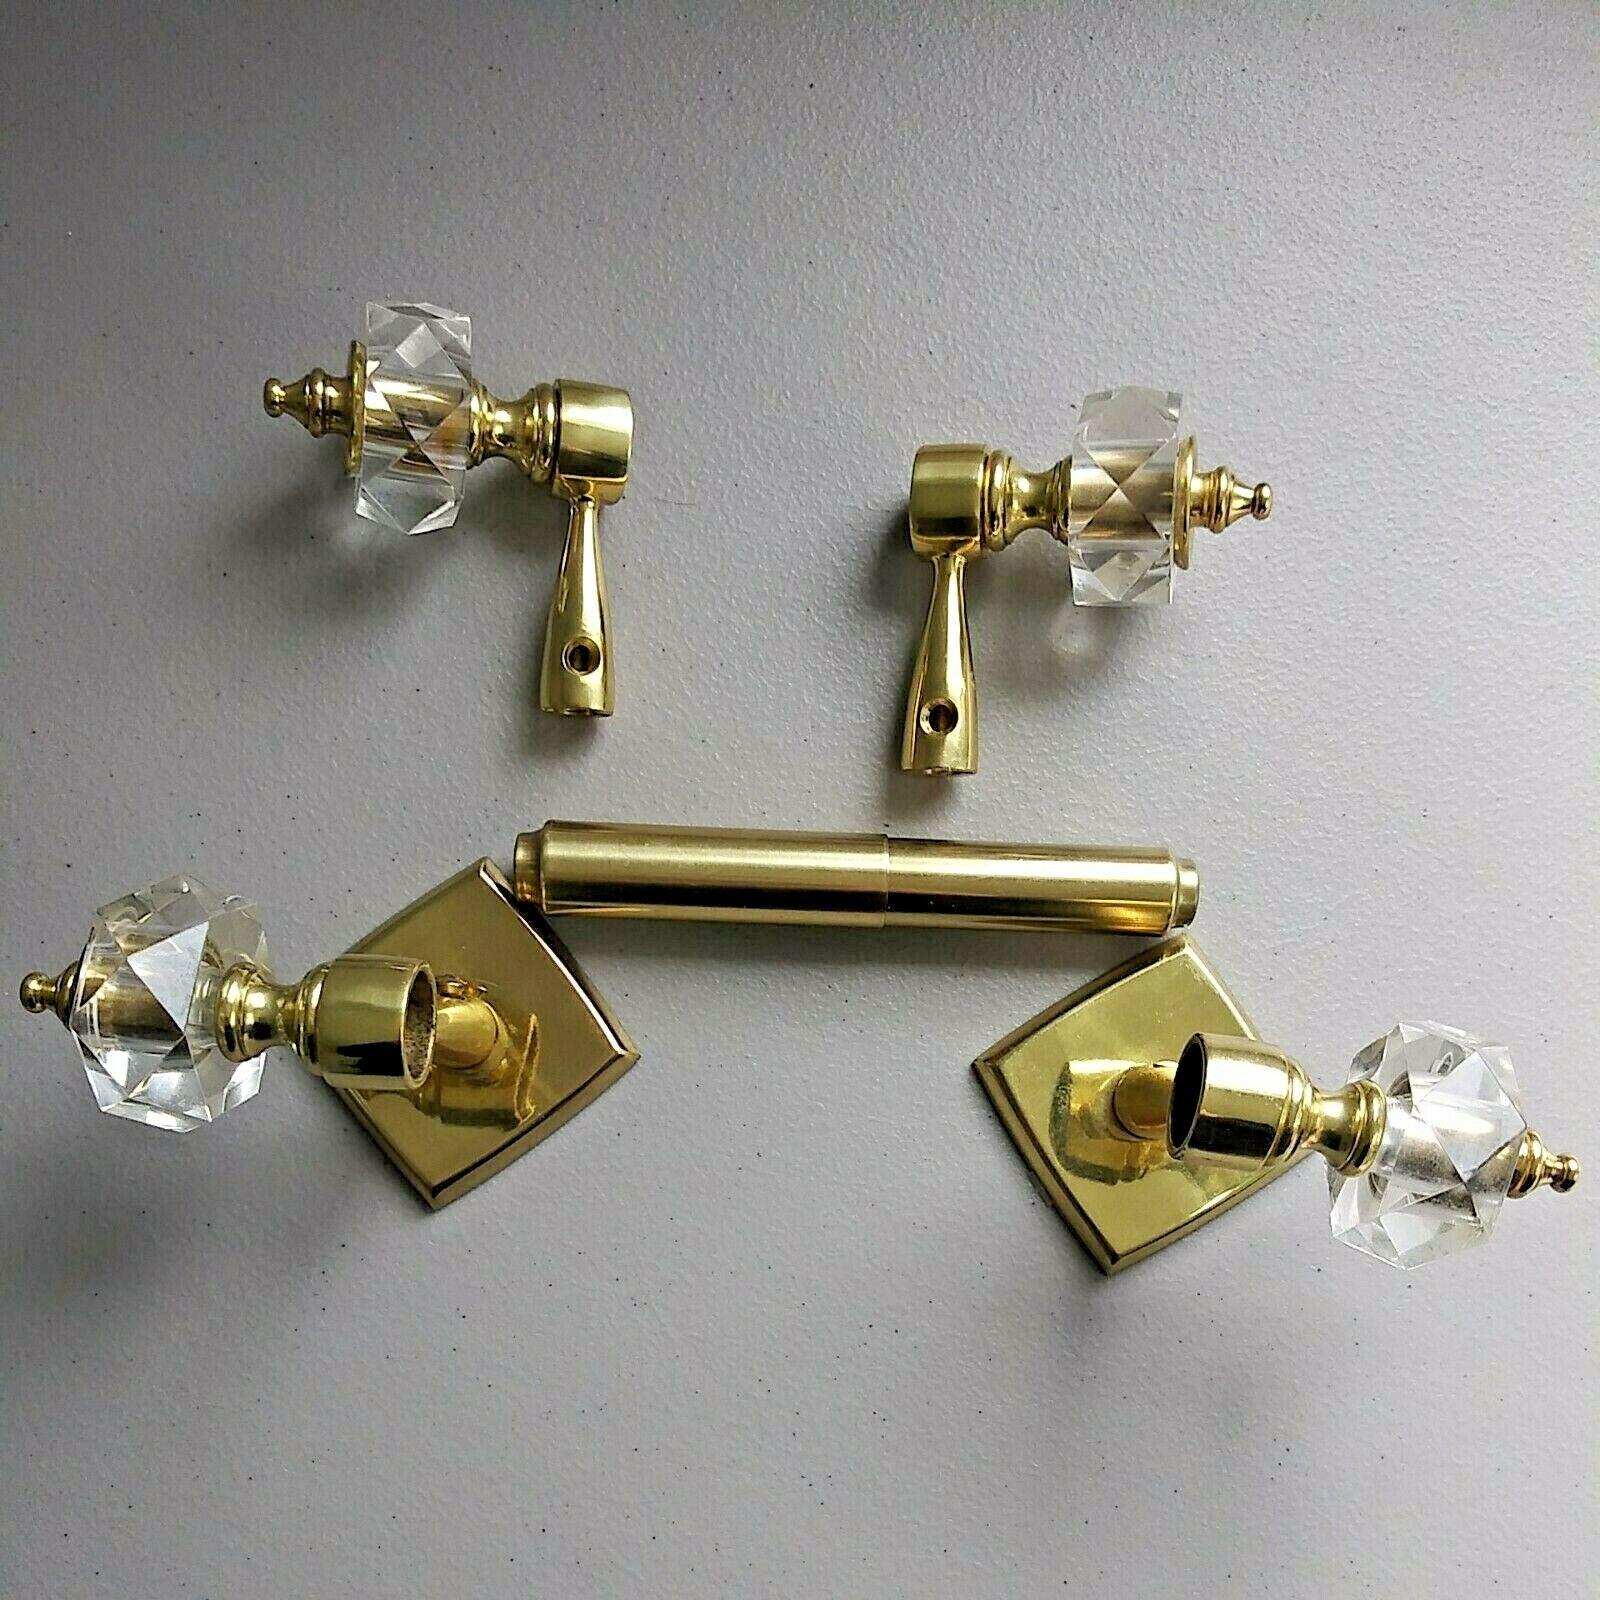 Vintage Toilet Paper Holder Curtain Rod Holder Brass Finish Hollywood Regency